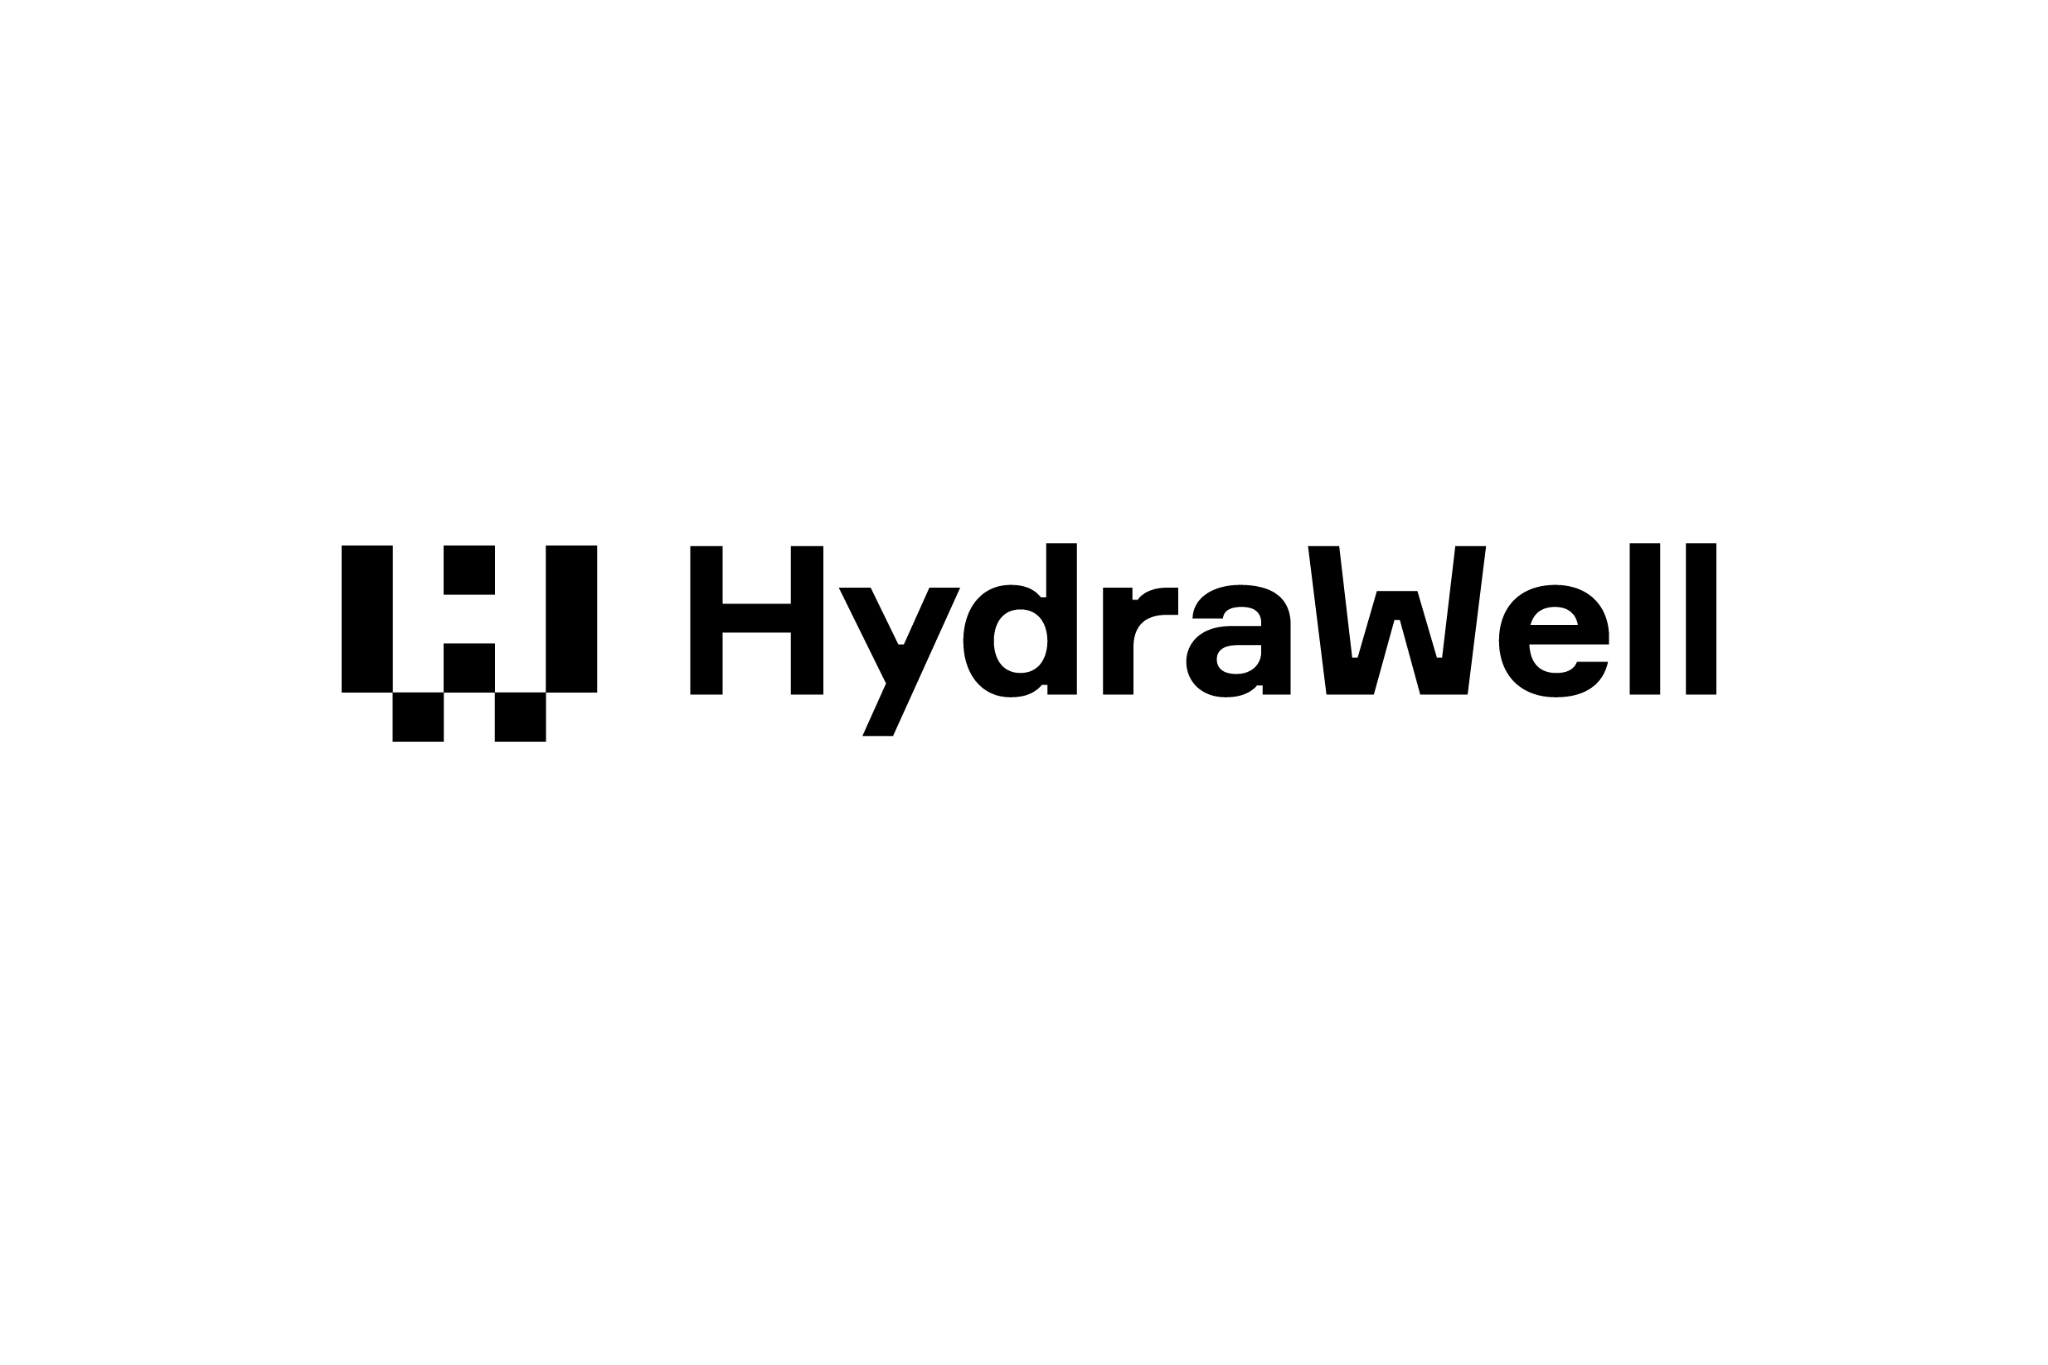 New visual identity for HydraWell